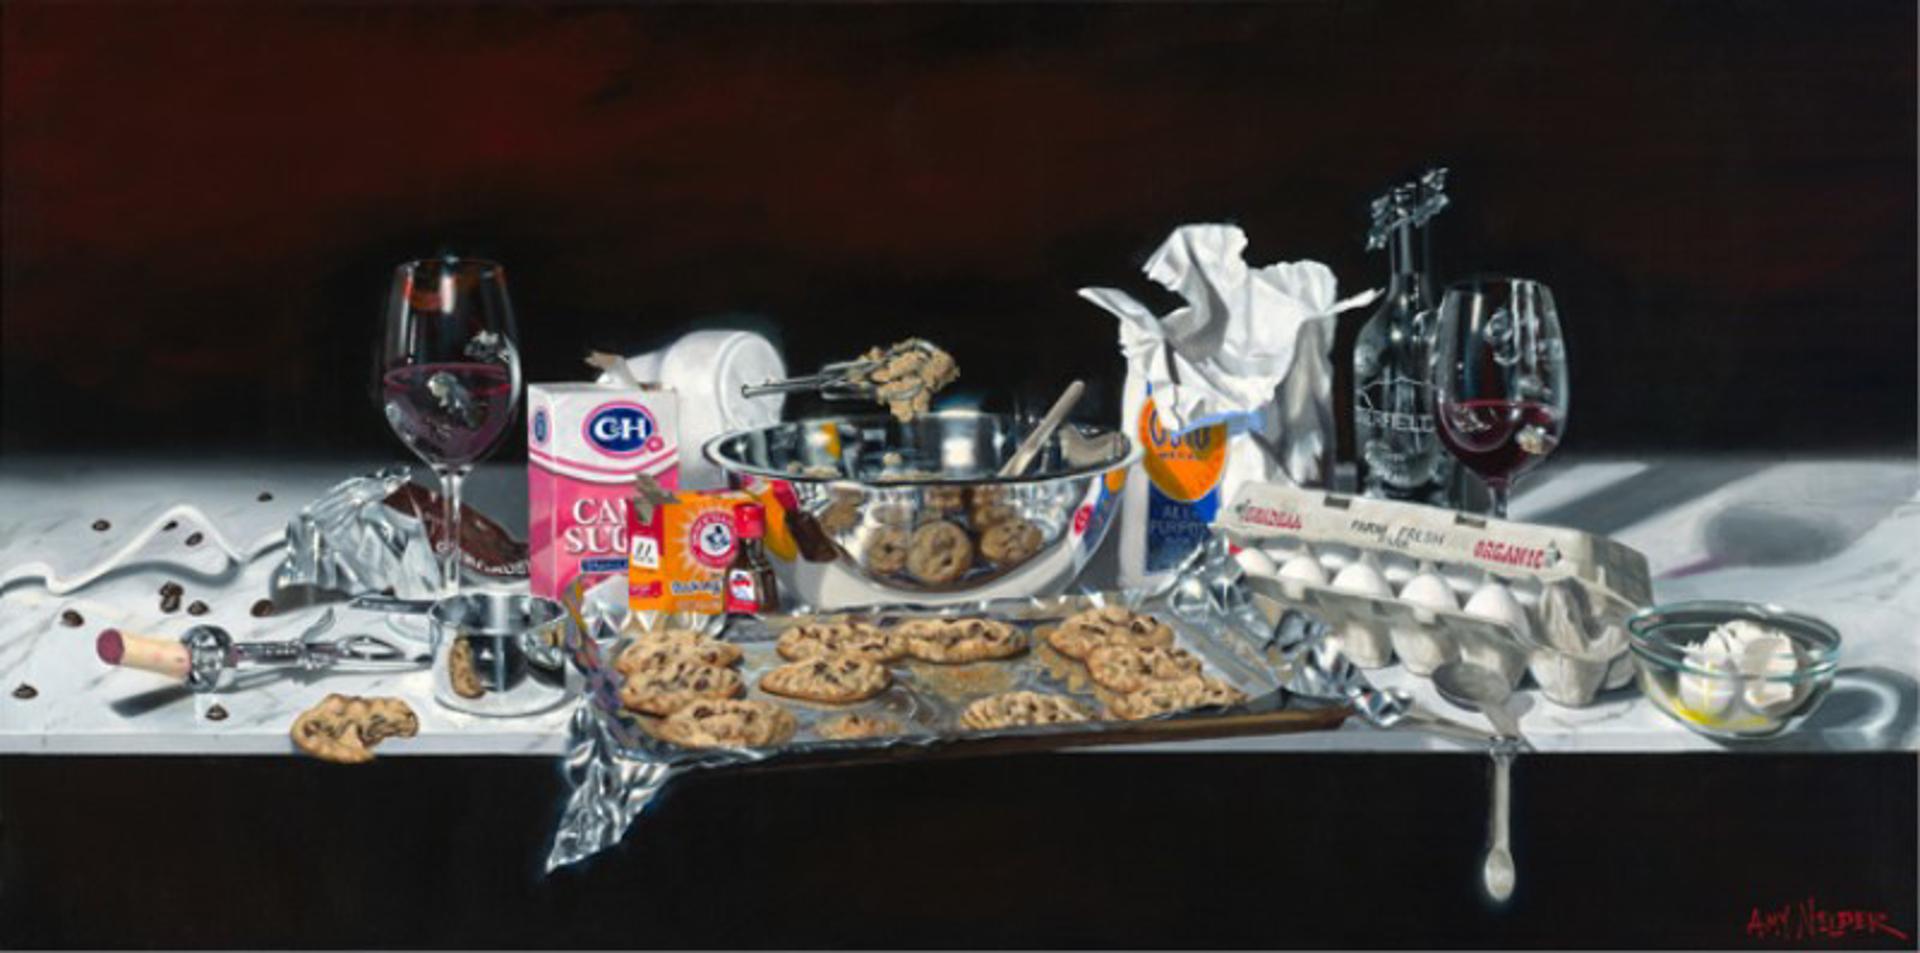 Your Kitchen, Or Mine? by Amy Nelder